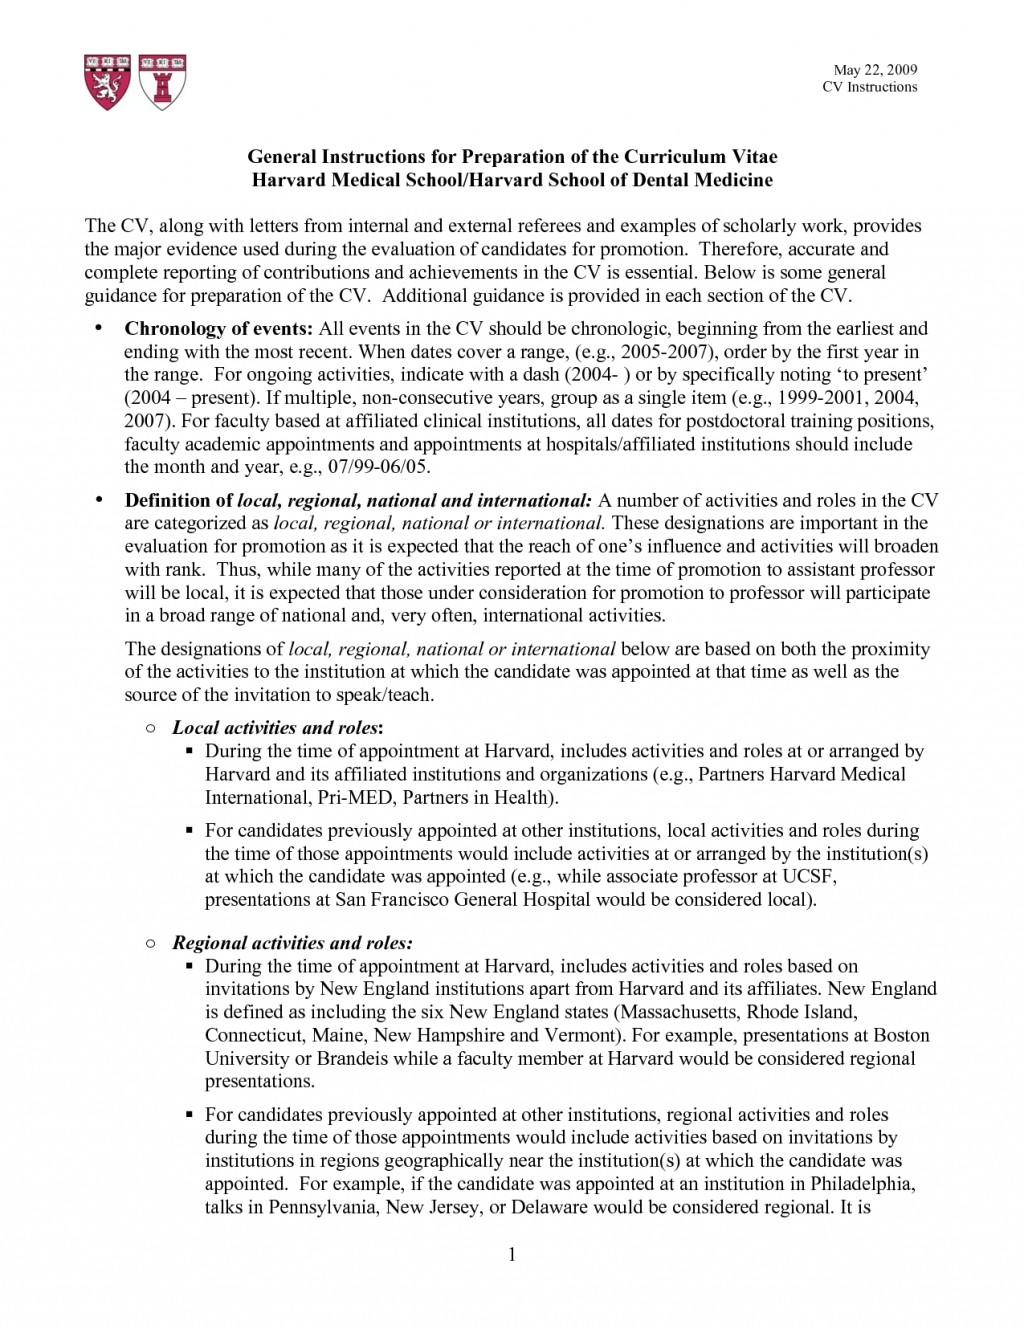 011 Harvard Accepted Essays Essay Example Cv Template Medical School Fantastic Business Reddit College Book Large